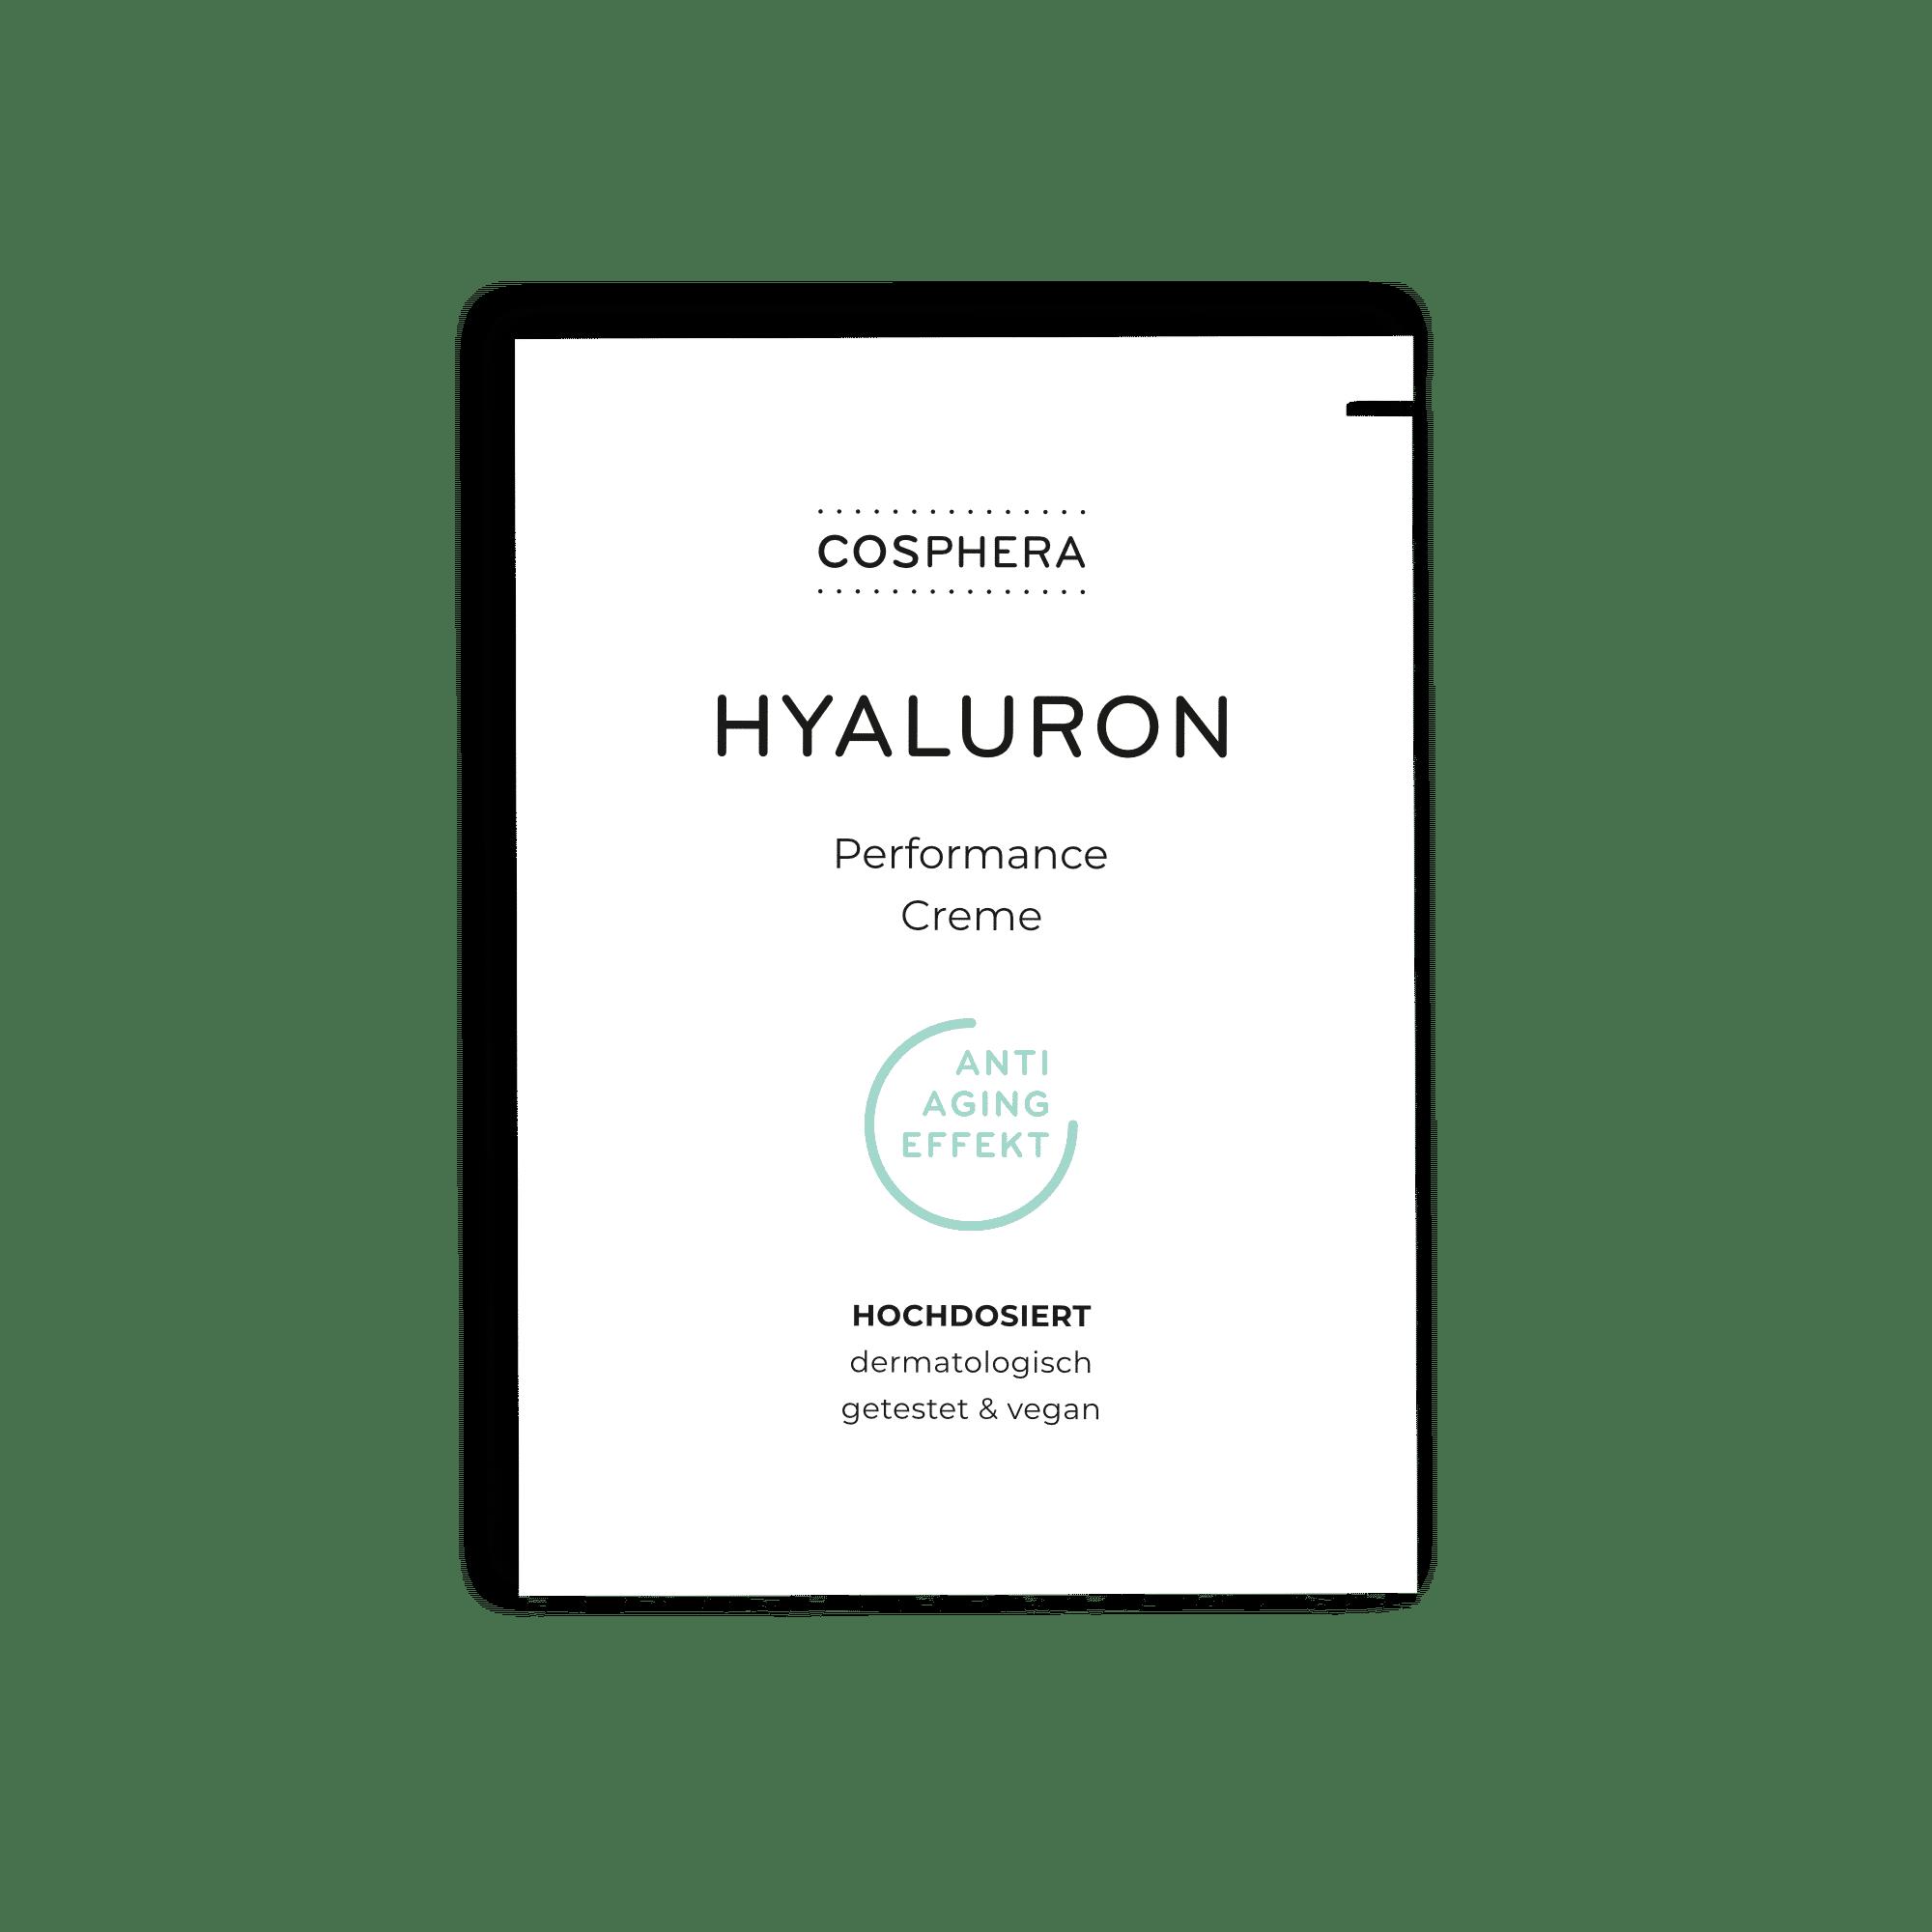 Hyaluron Performance Creme Probe (2-ml Sachet)